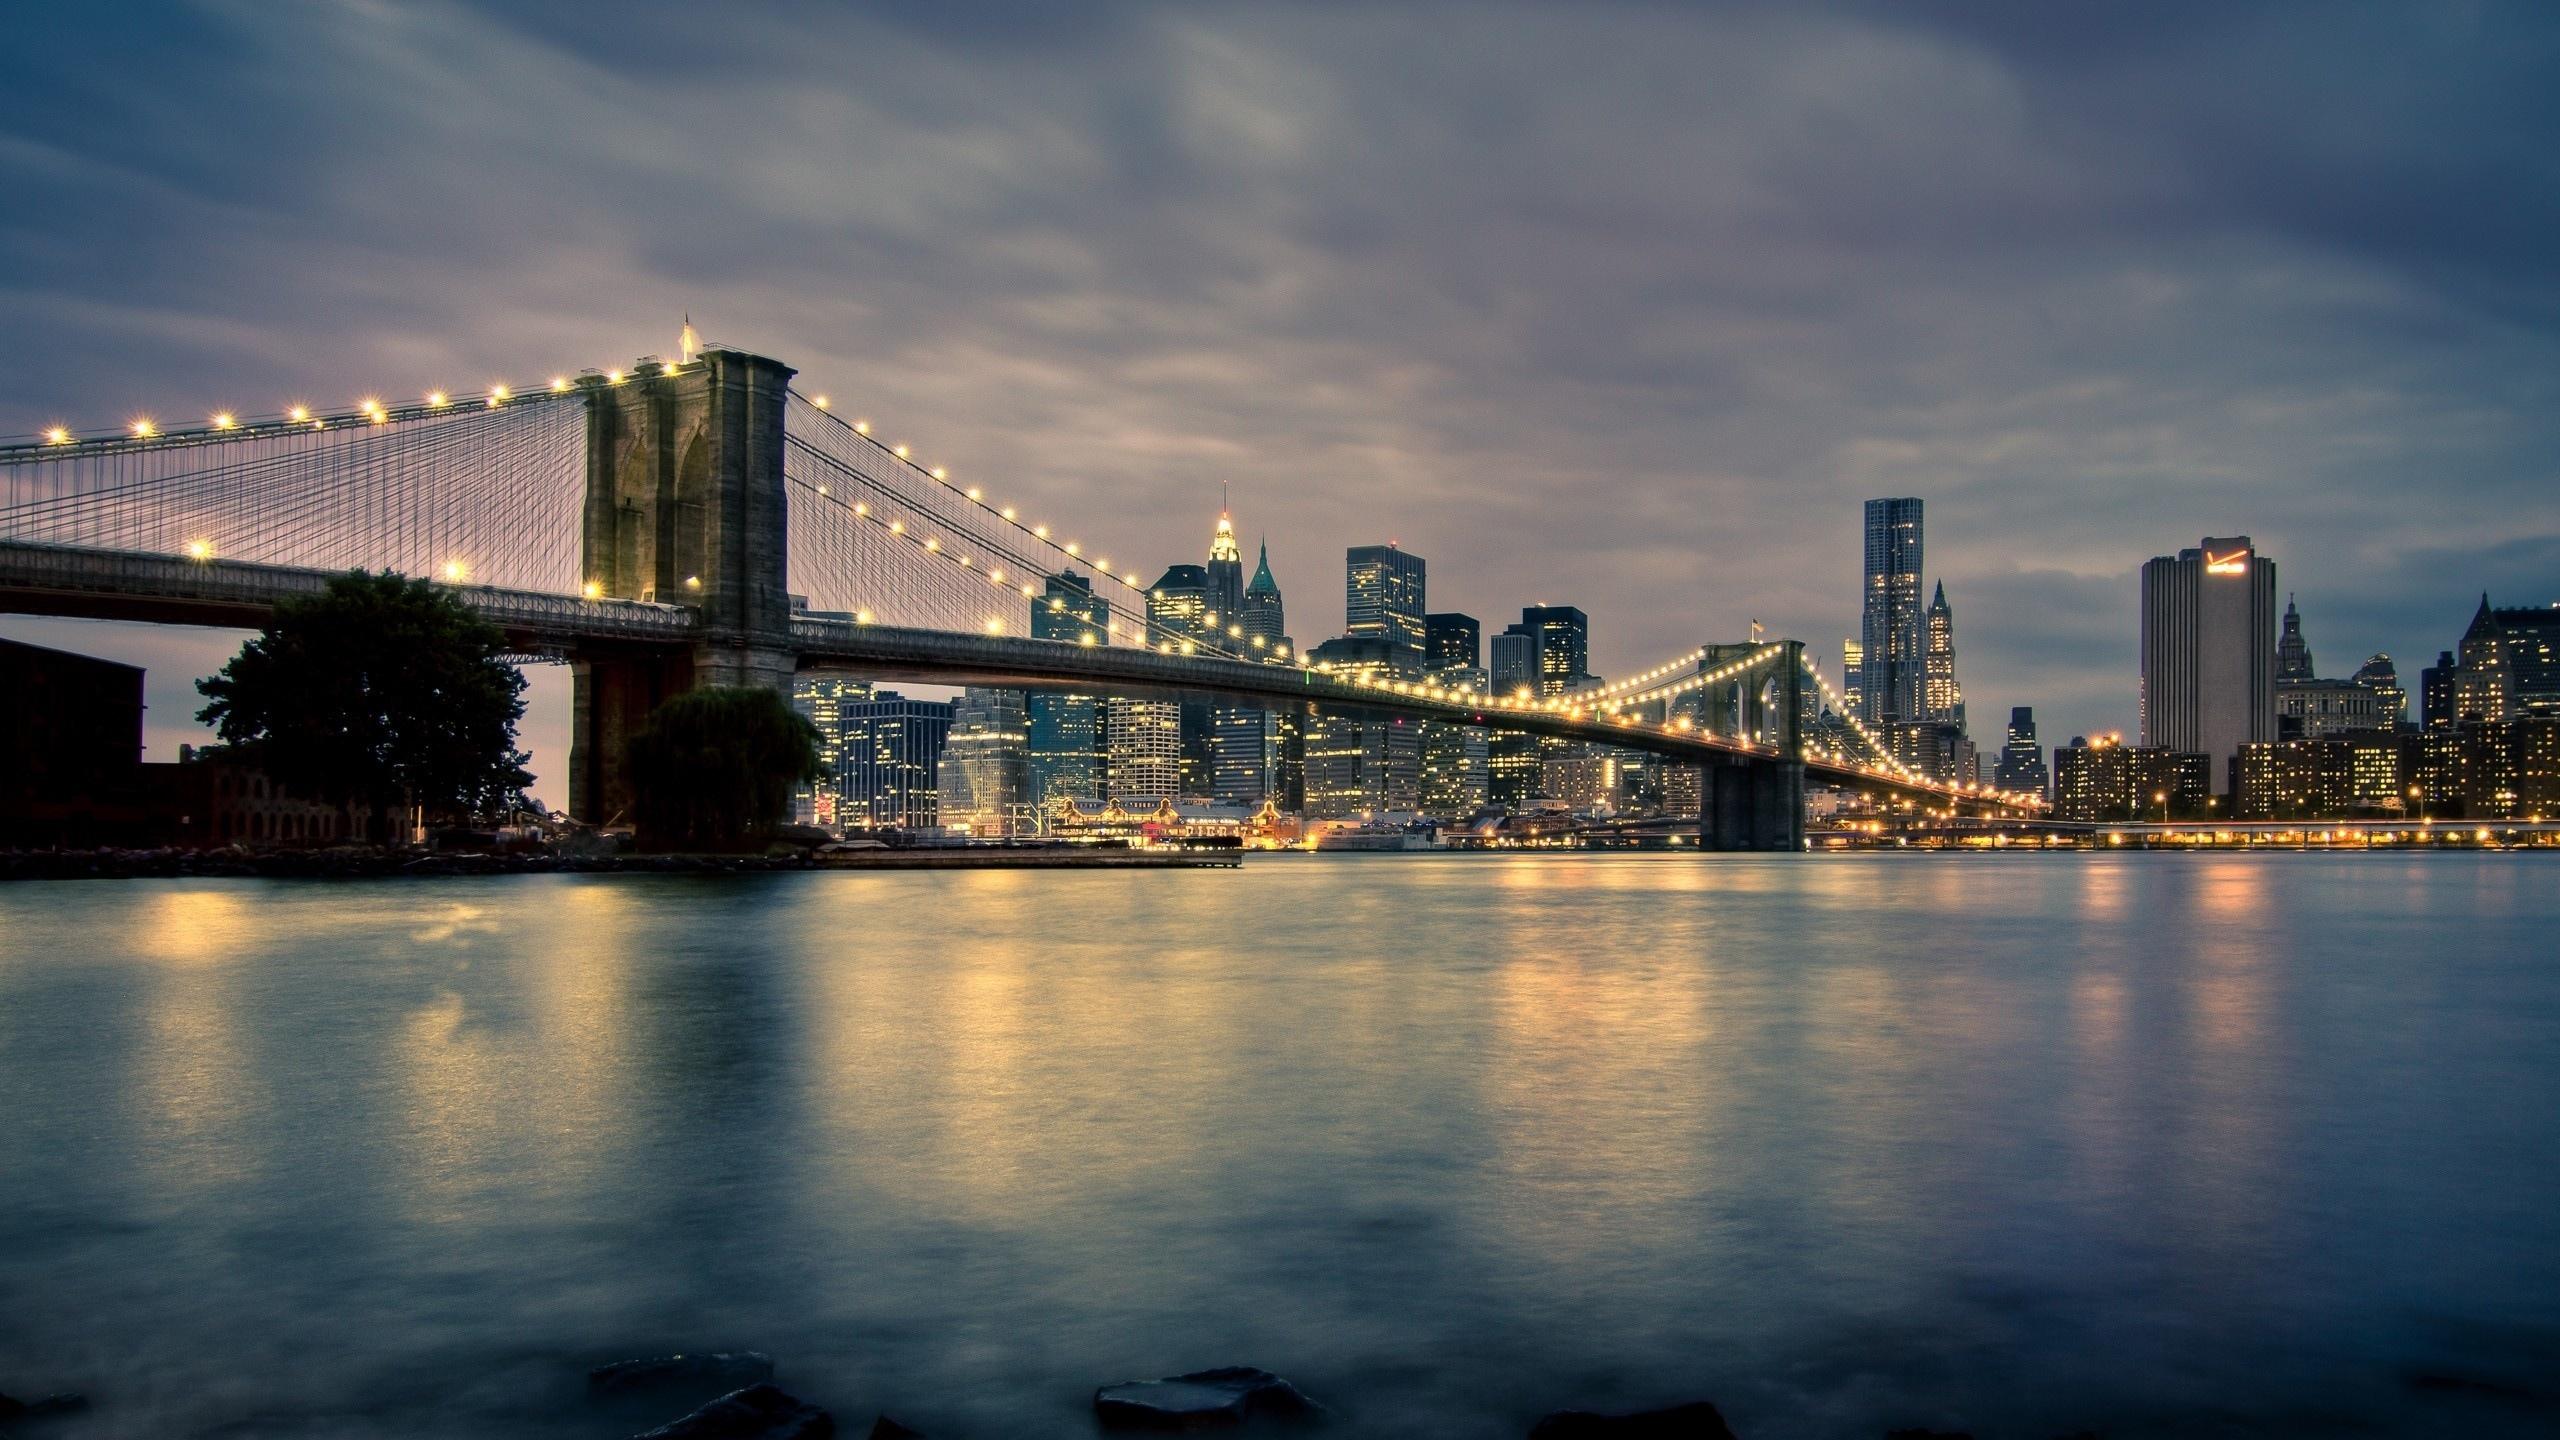 Man Made Brooklyn Bridge Wallpaper Px Free Download